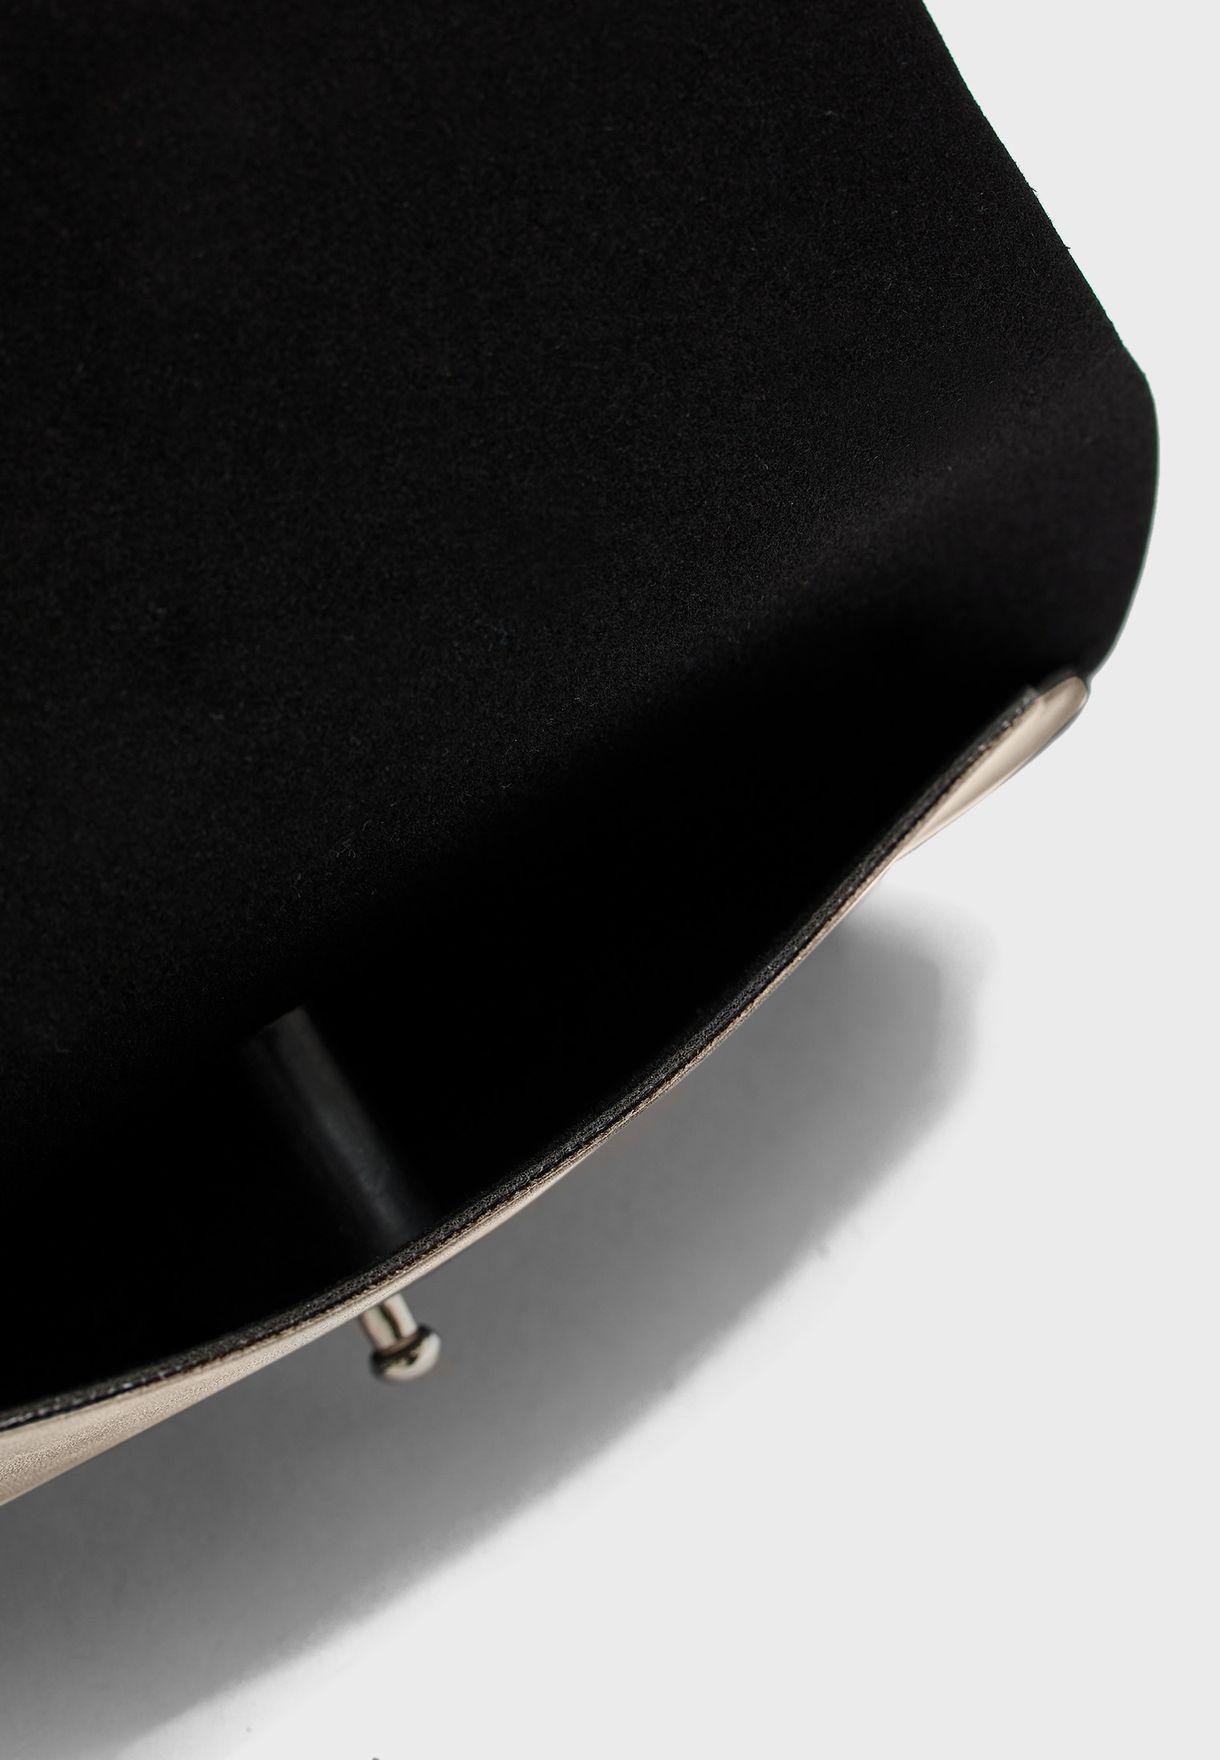 Faux Suede Elastic Strap Sunglasses Case